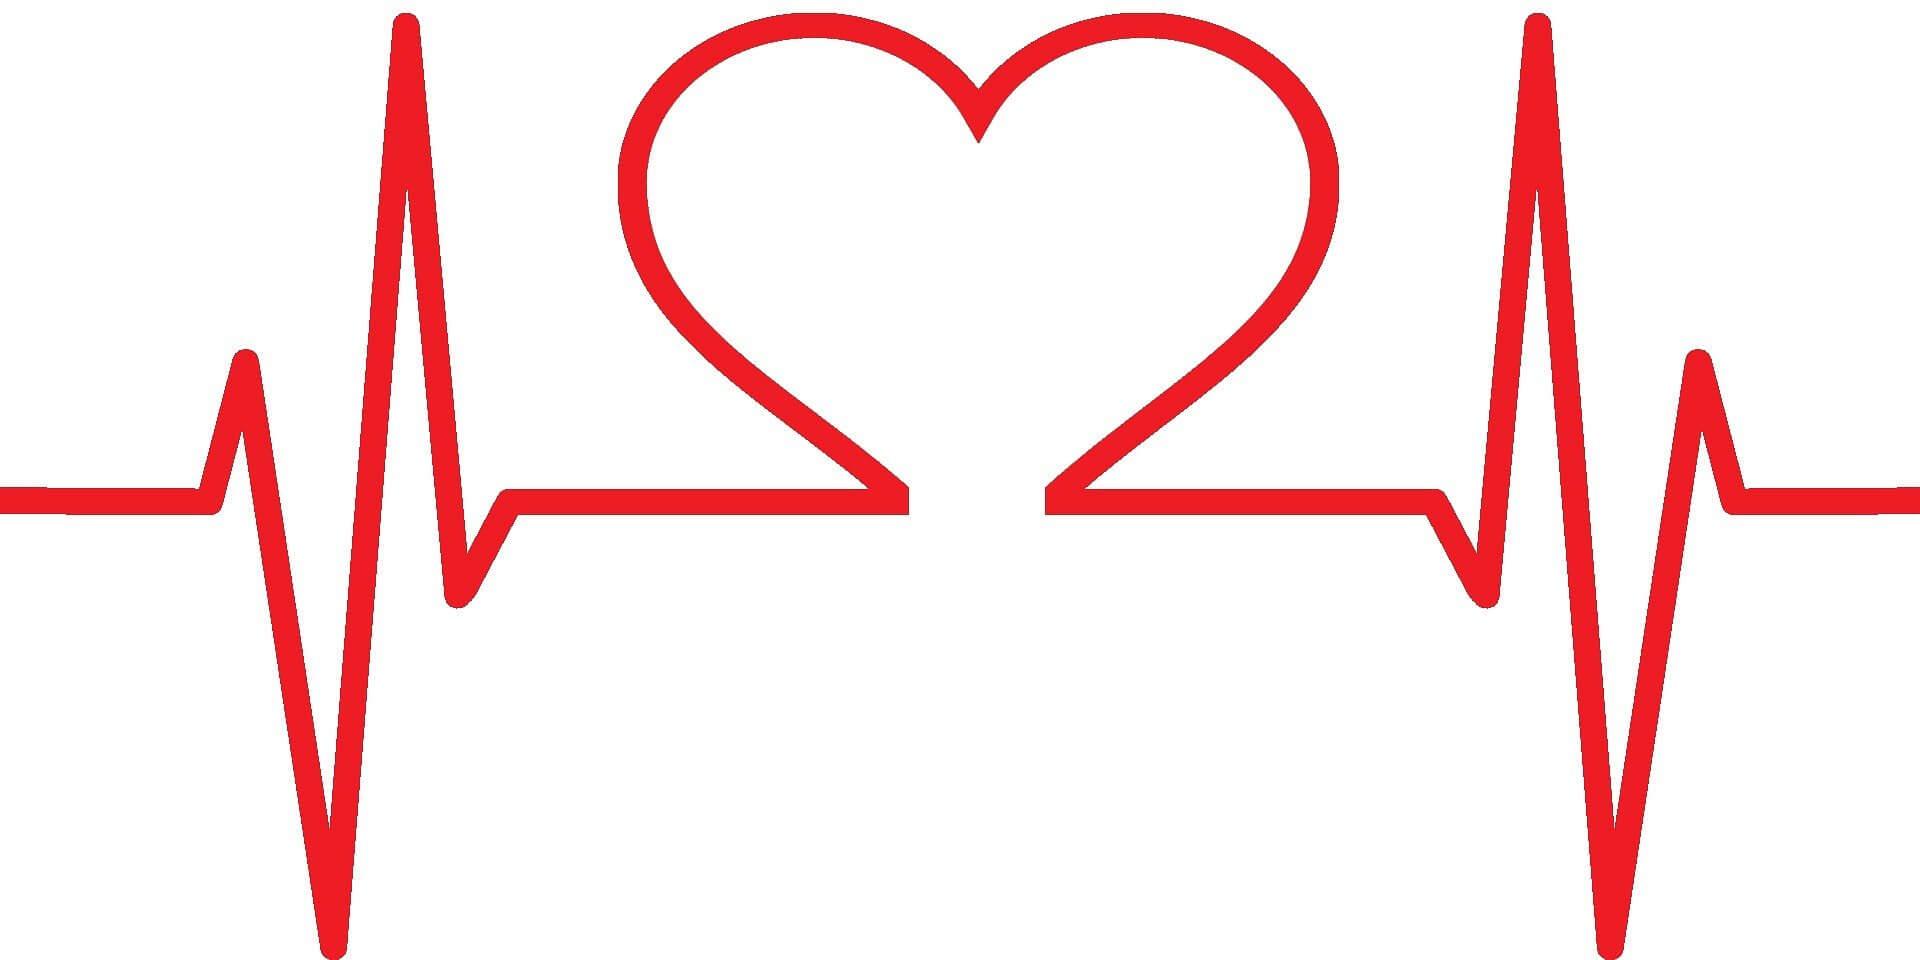 semundjet e zemres, si te mbrojme zemren